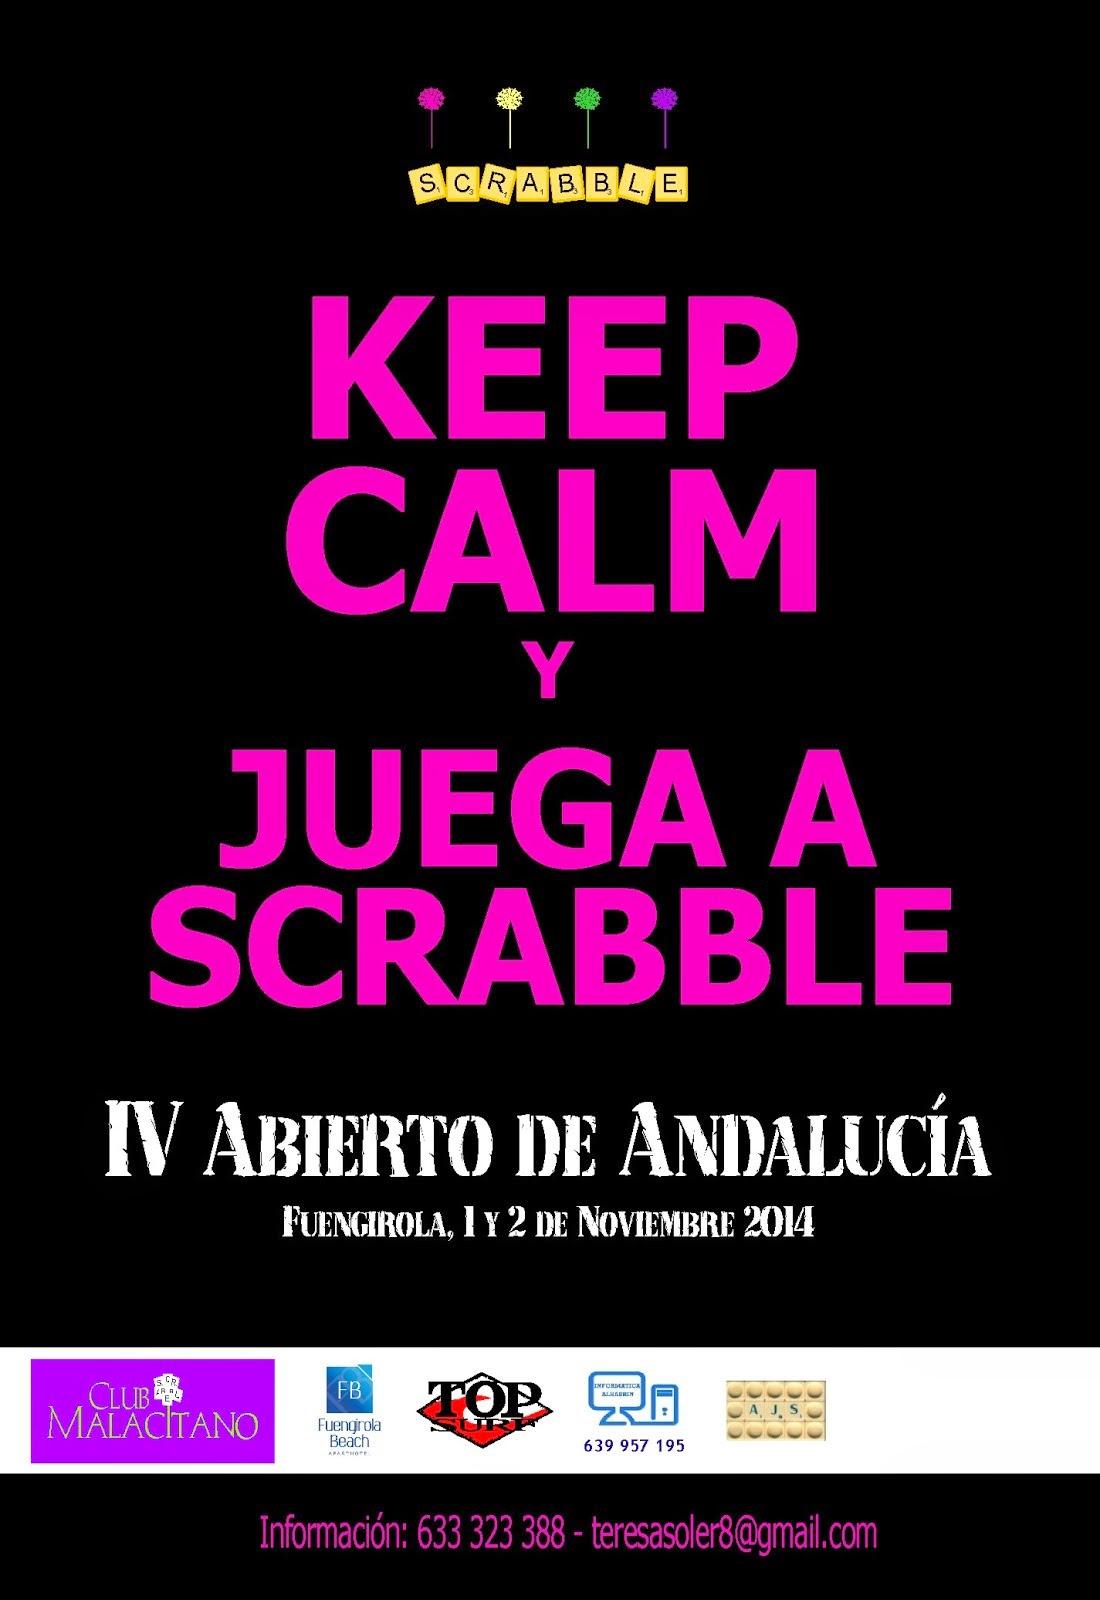 IV Abierto de Andalucía de Scrabble